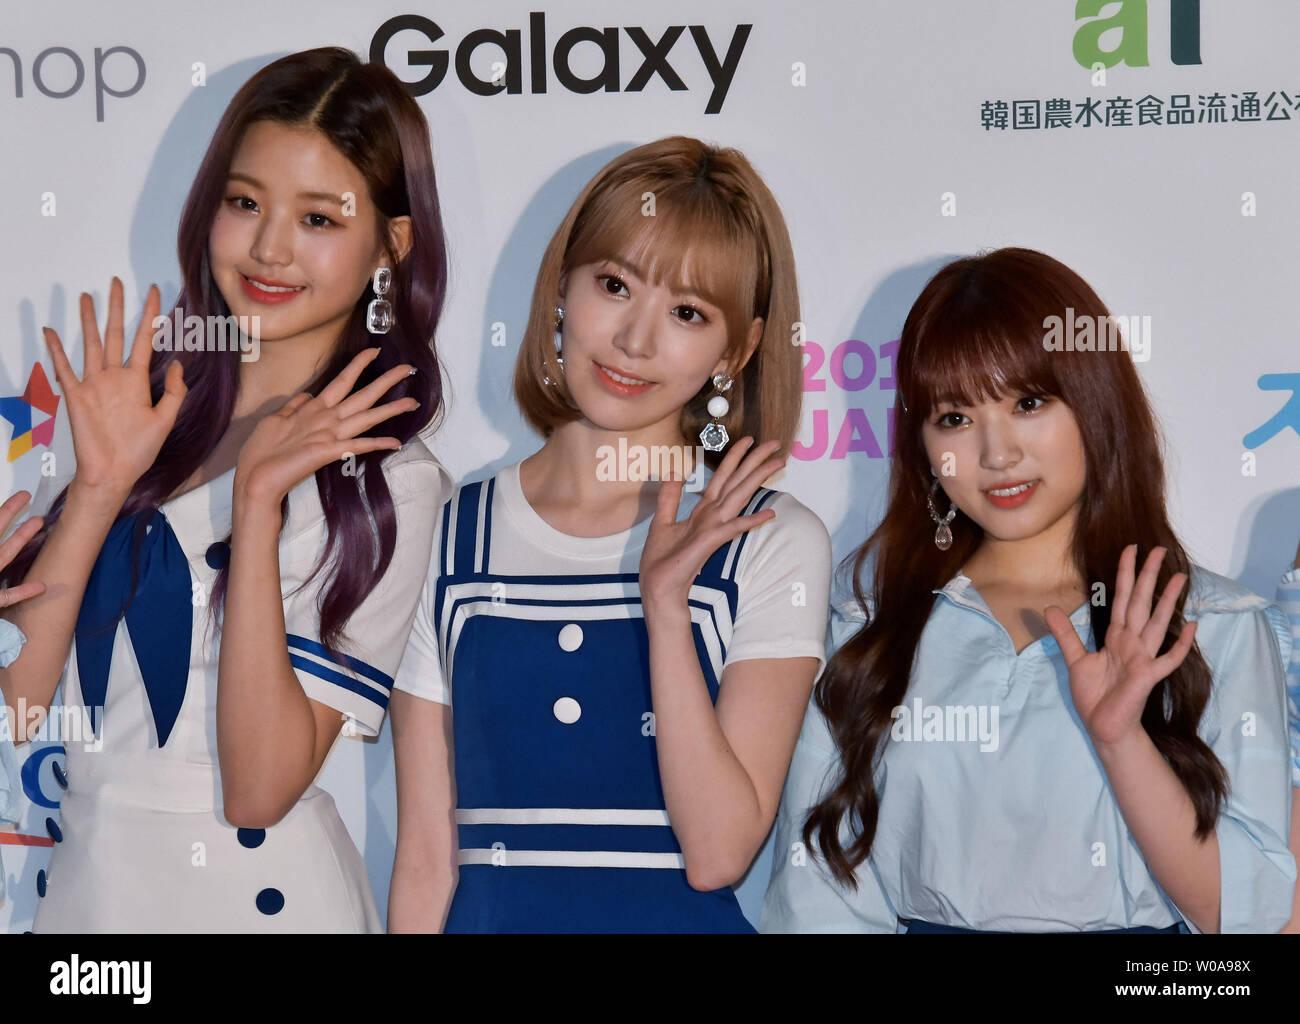 Members of South Korean and Japanese girl group IZ*ONE pose